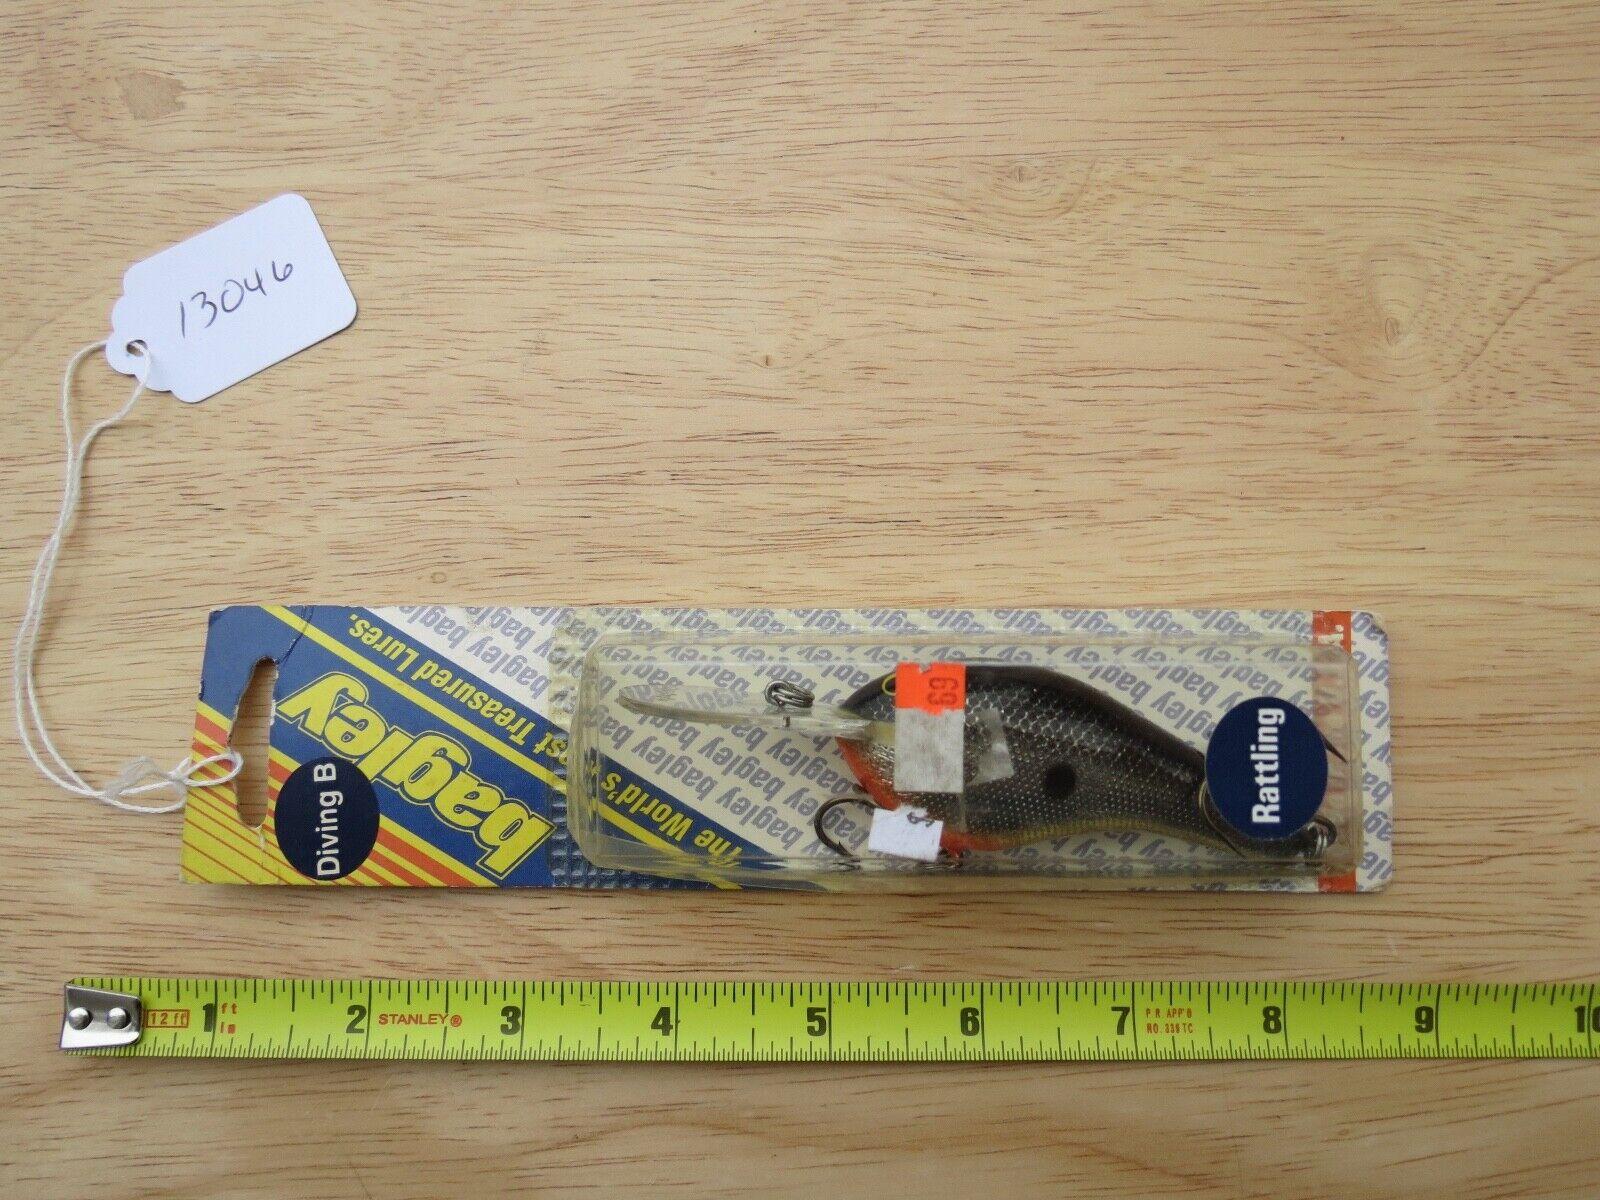 Bagleys Diving B3 Rattling DB3R B8 fishing lure made in USA  (lot)